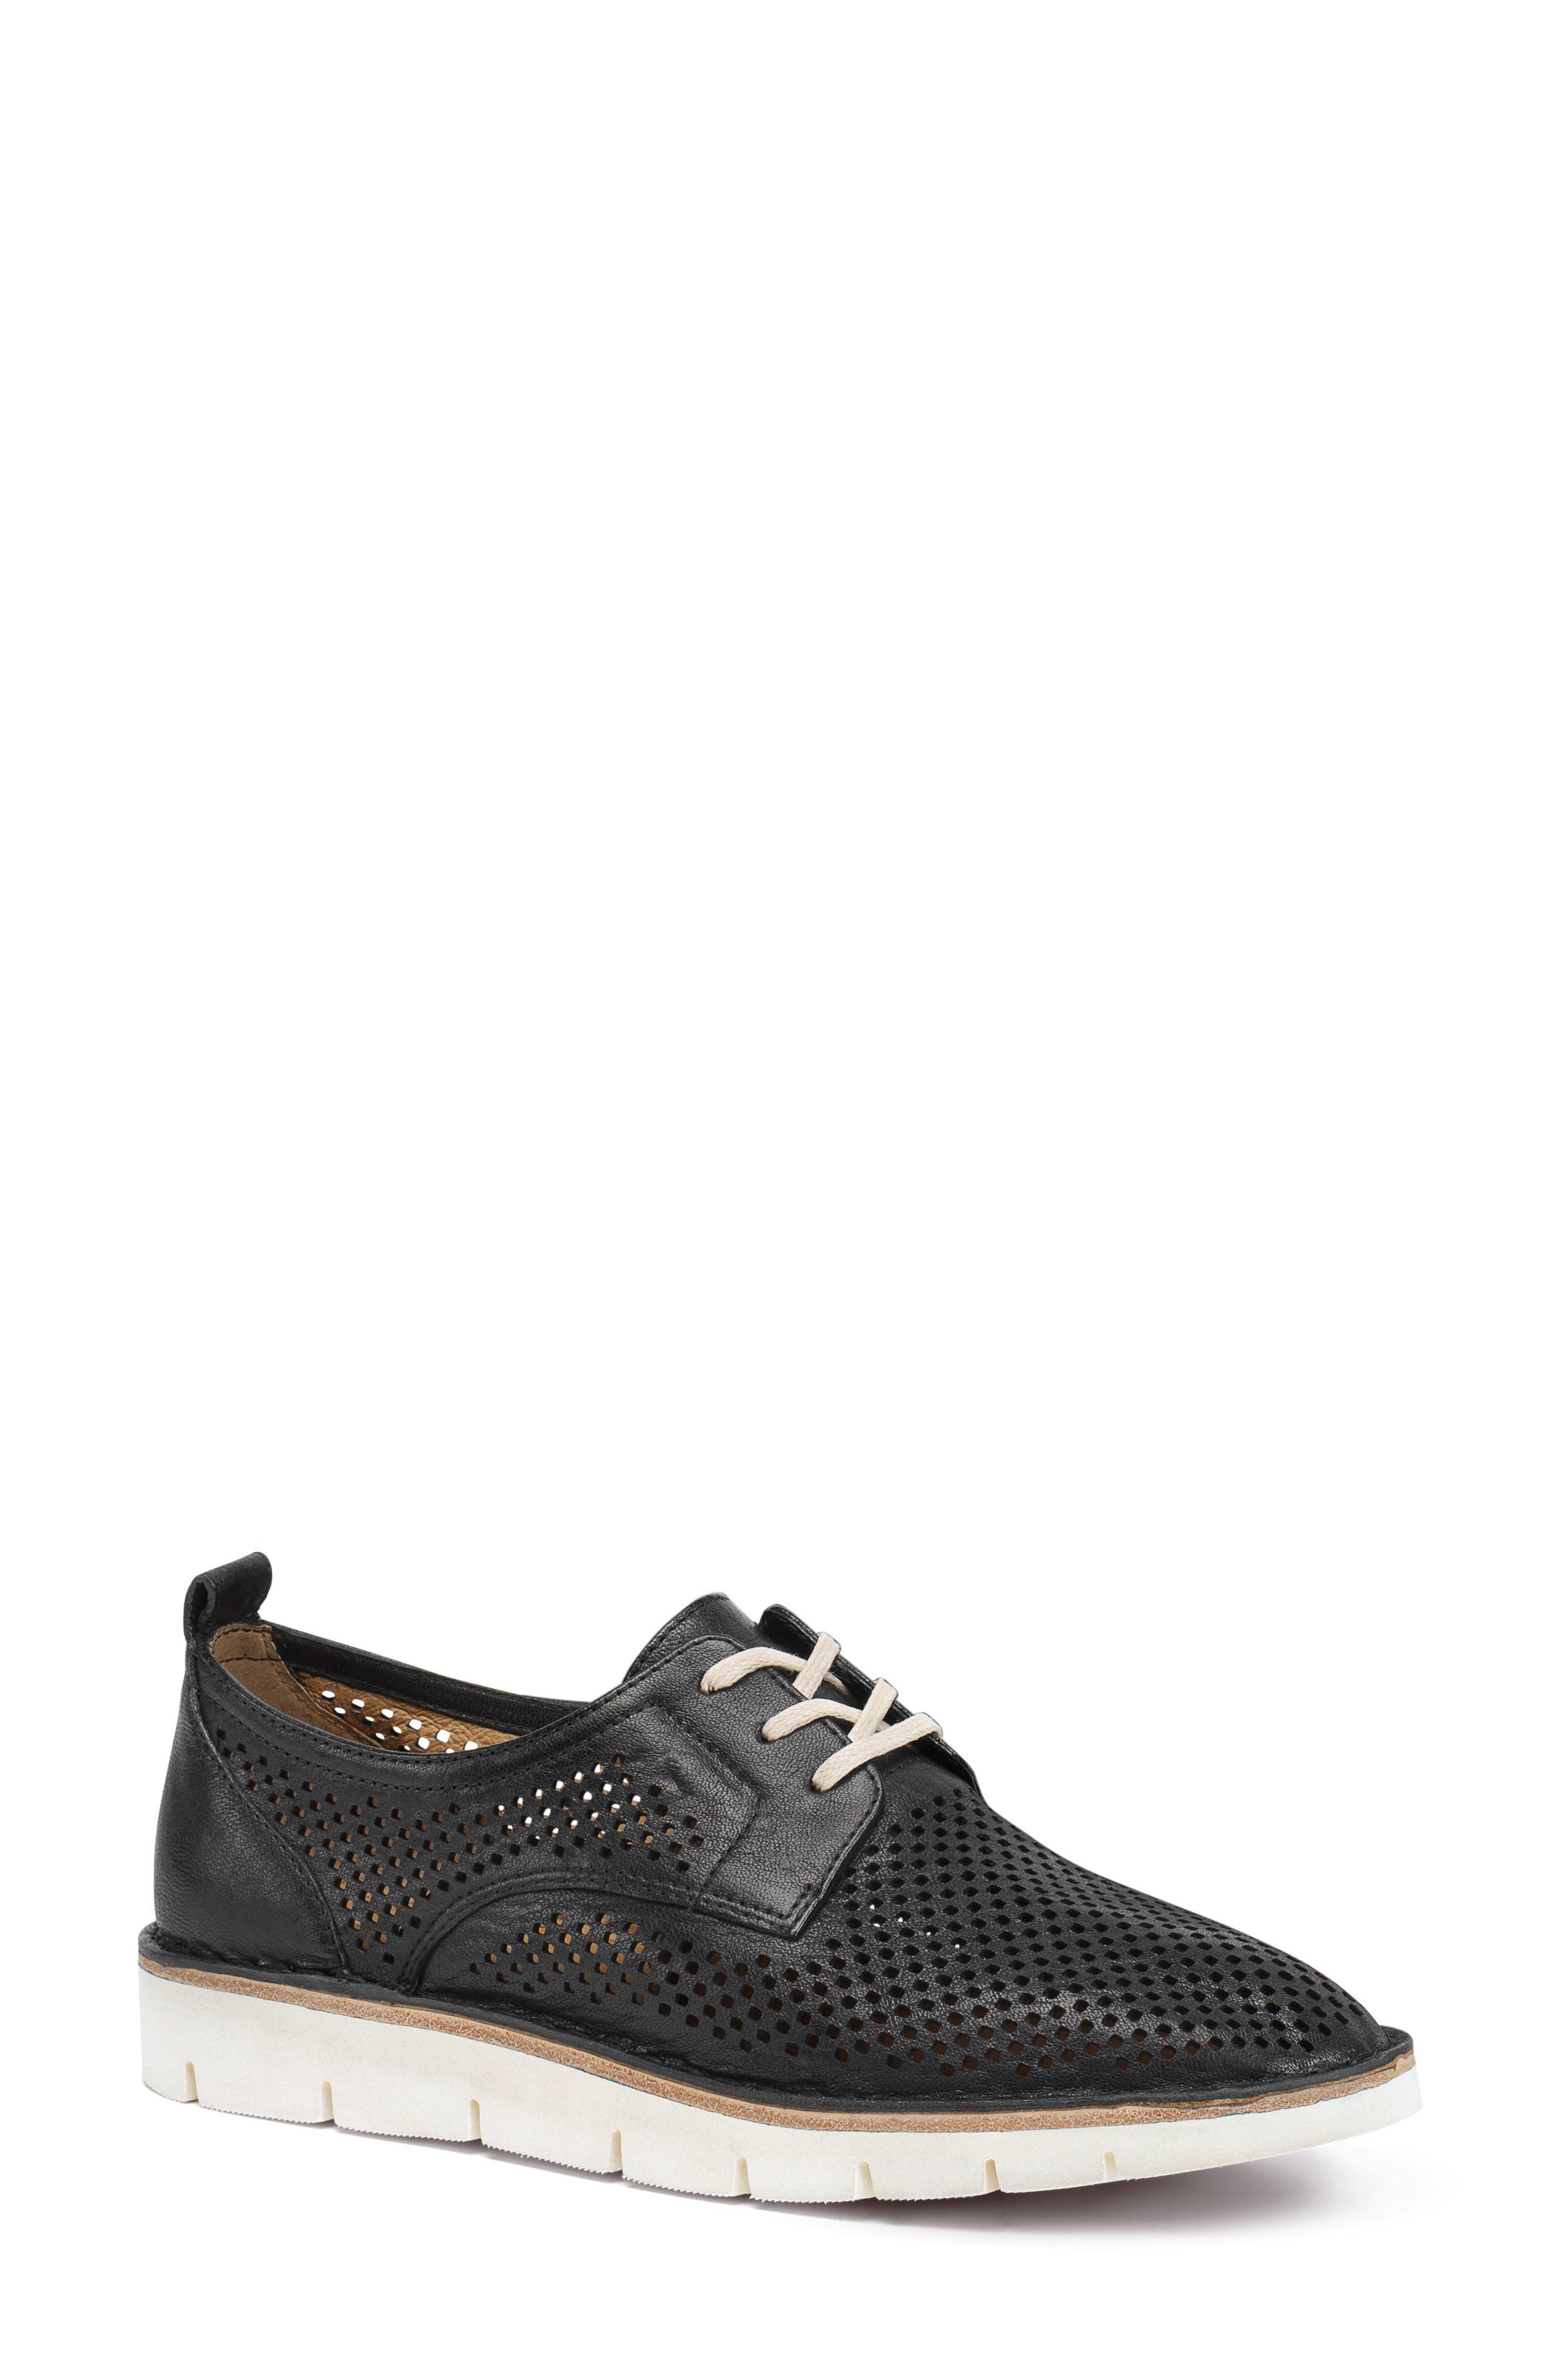 Lena Sneaker,                             Main thumbnail 1, color,                             Black Leather